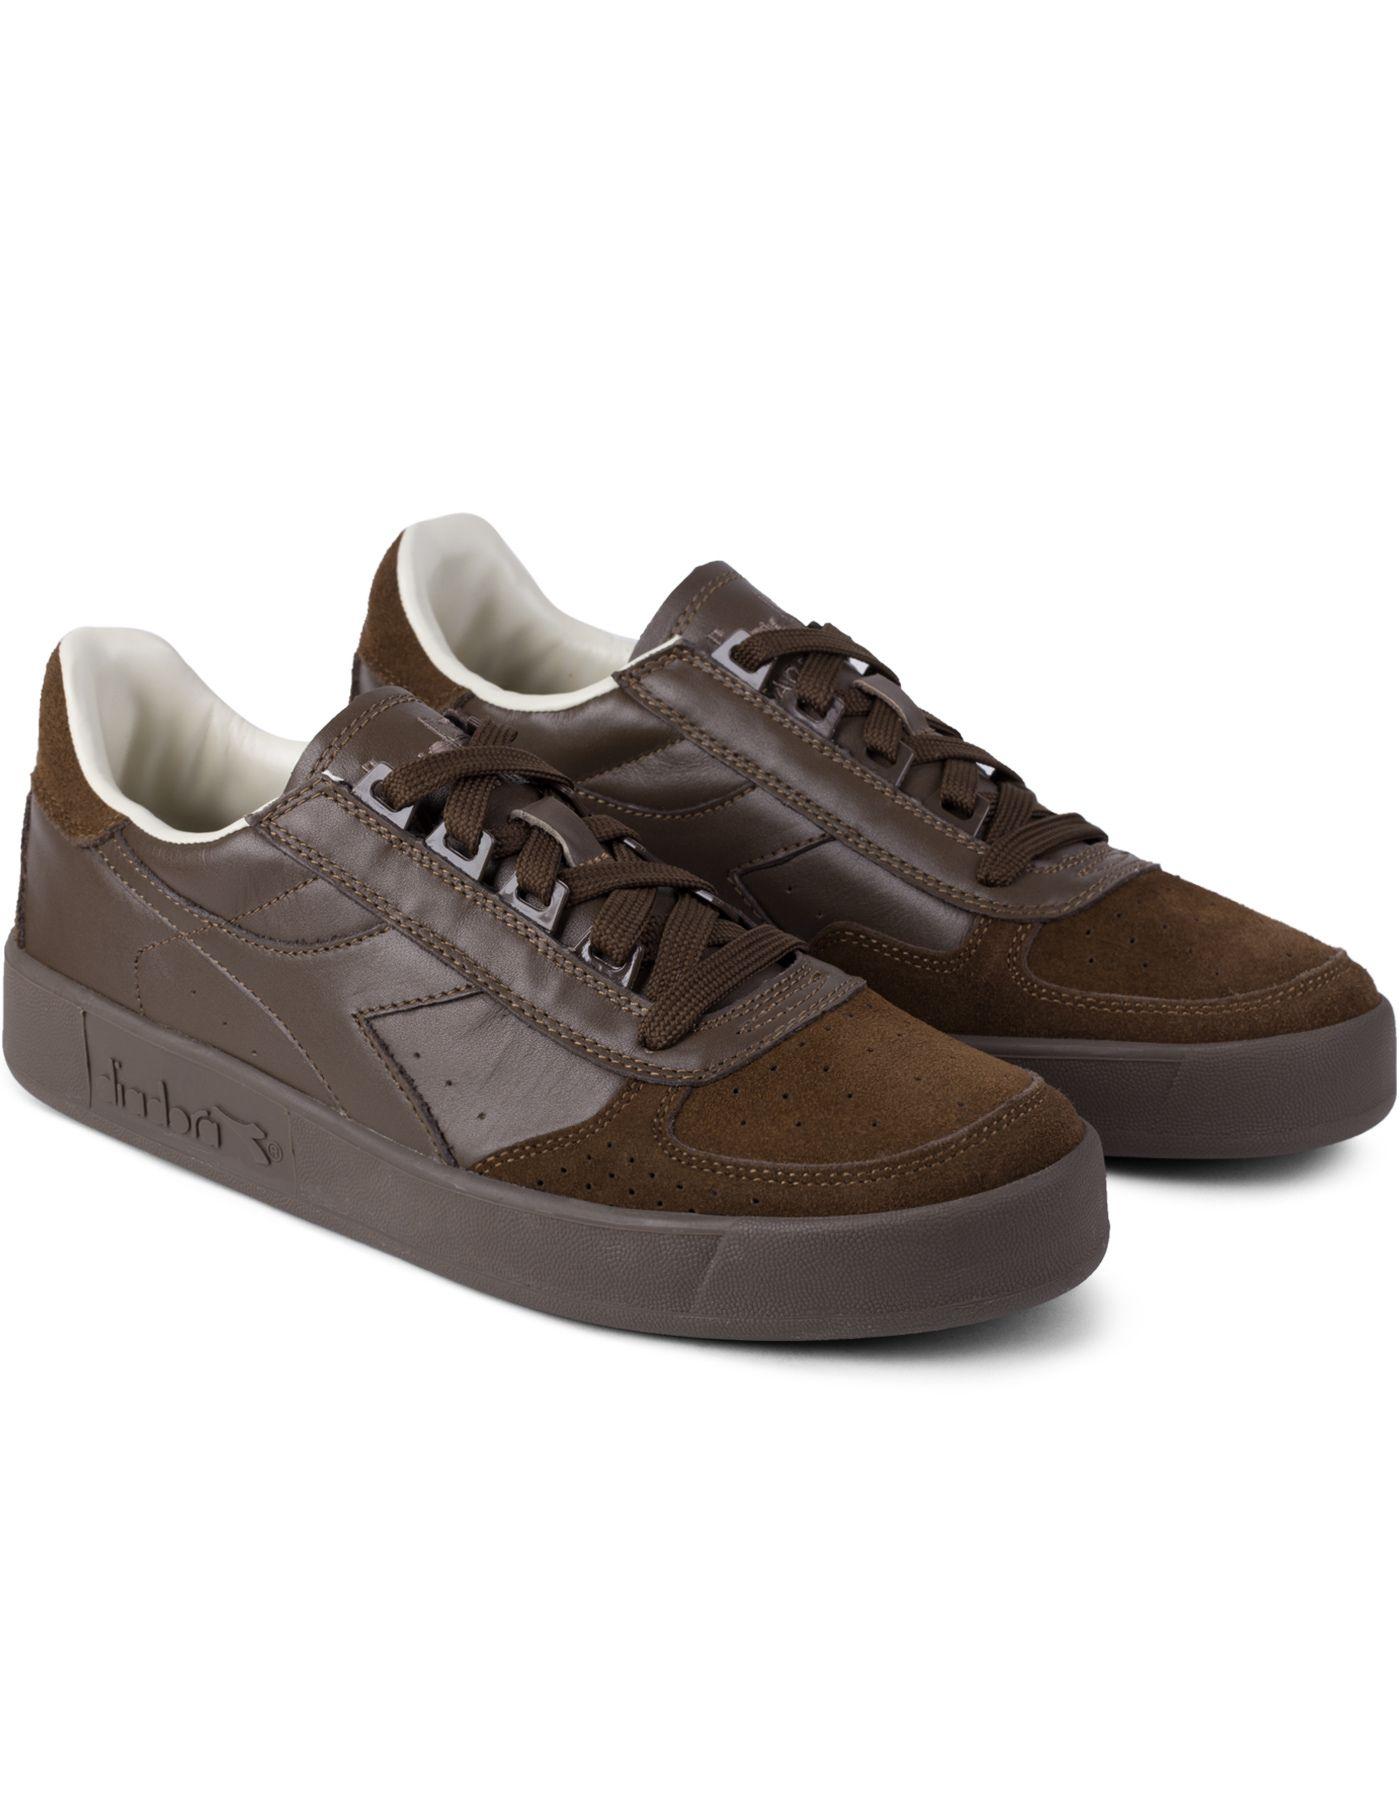 DIADORA - Brown B.Elite S ITA Sneakers   HBX